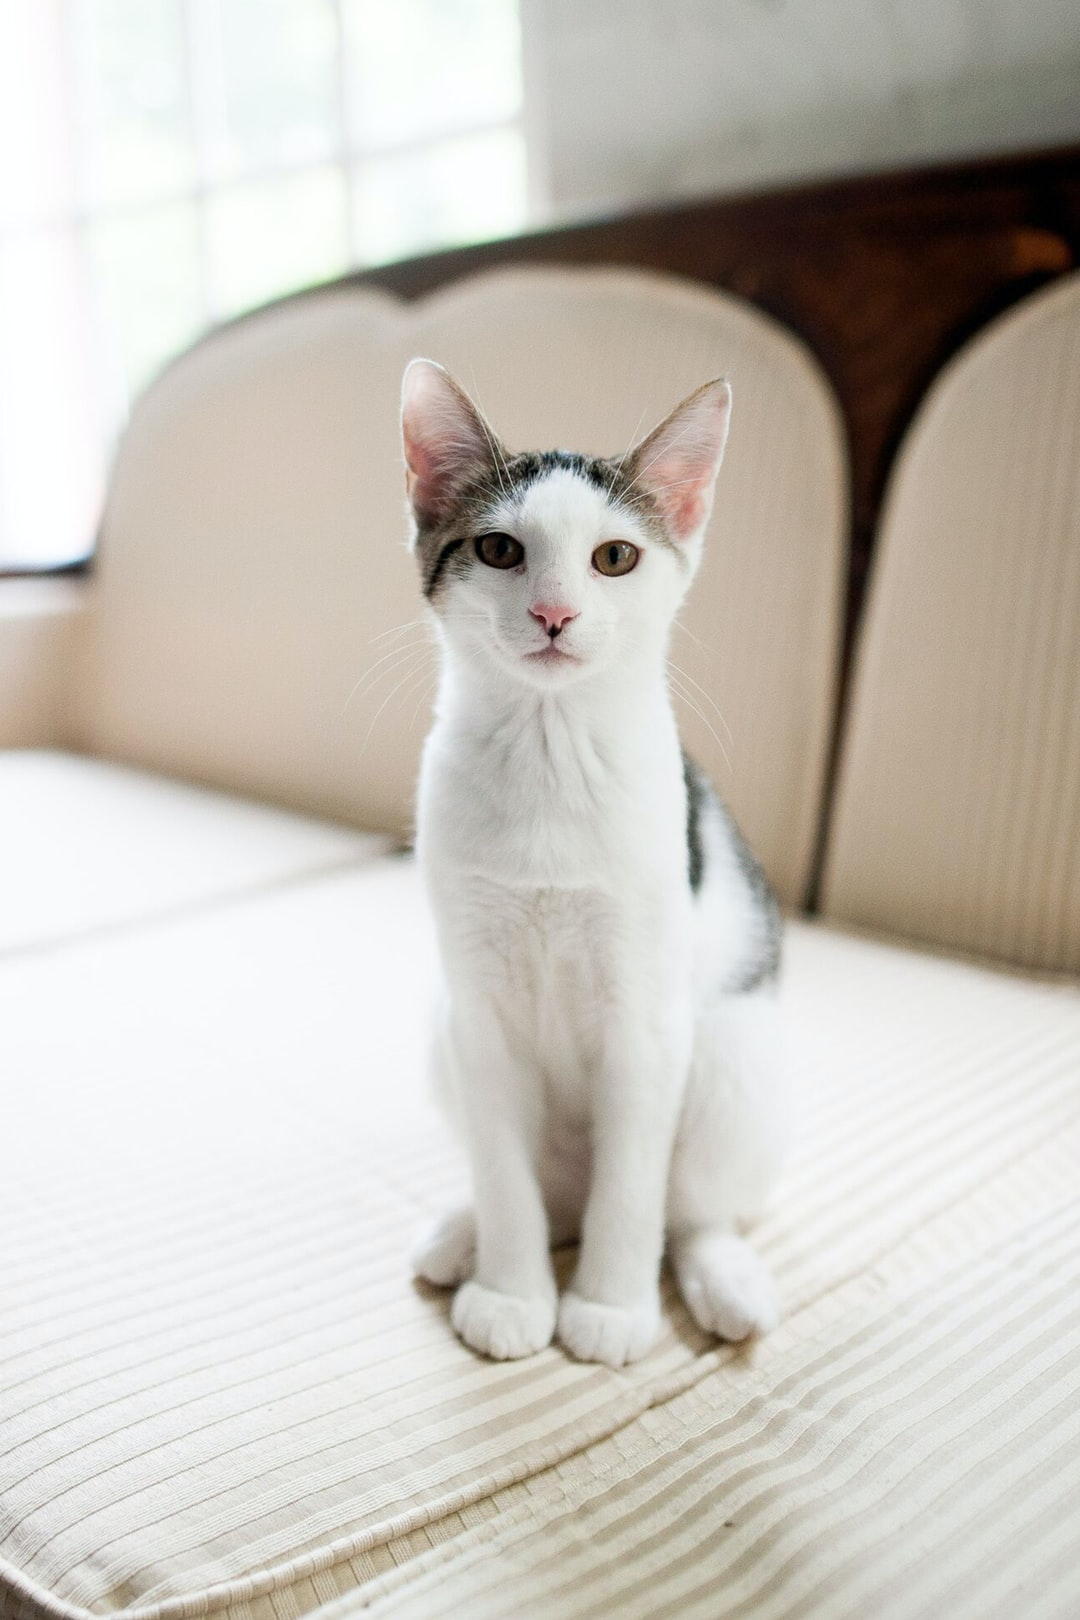 900 Cat Images Download Hd Pictures Photos On Unsplash